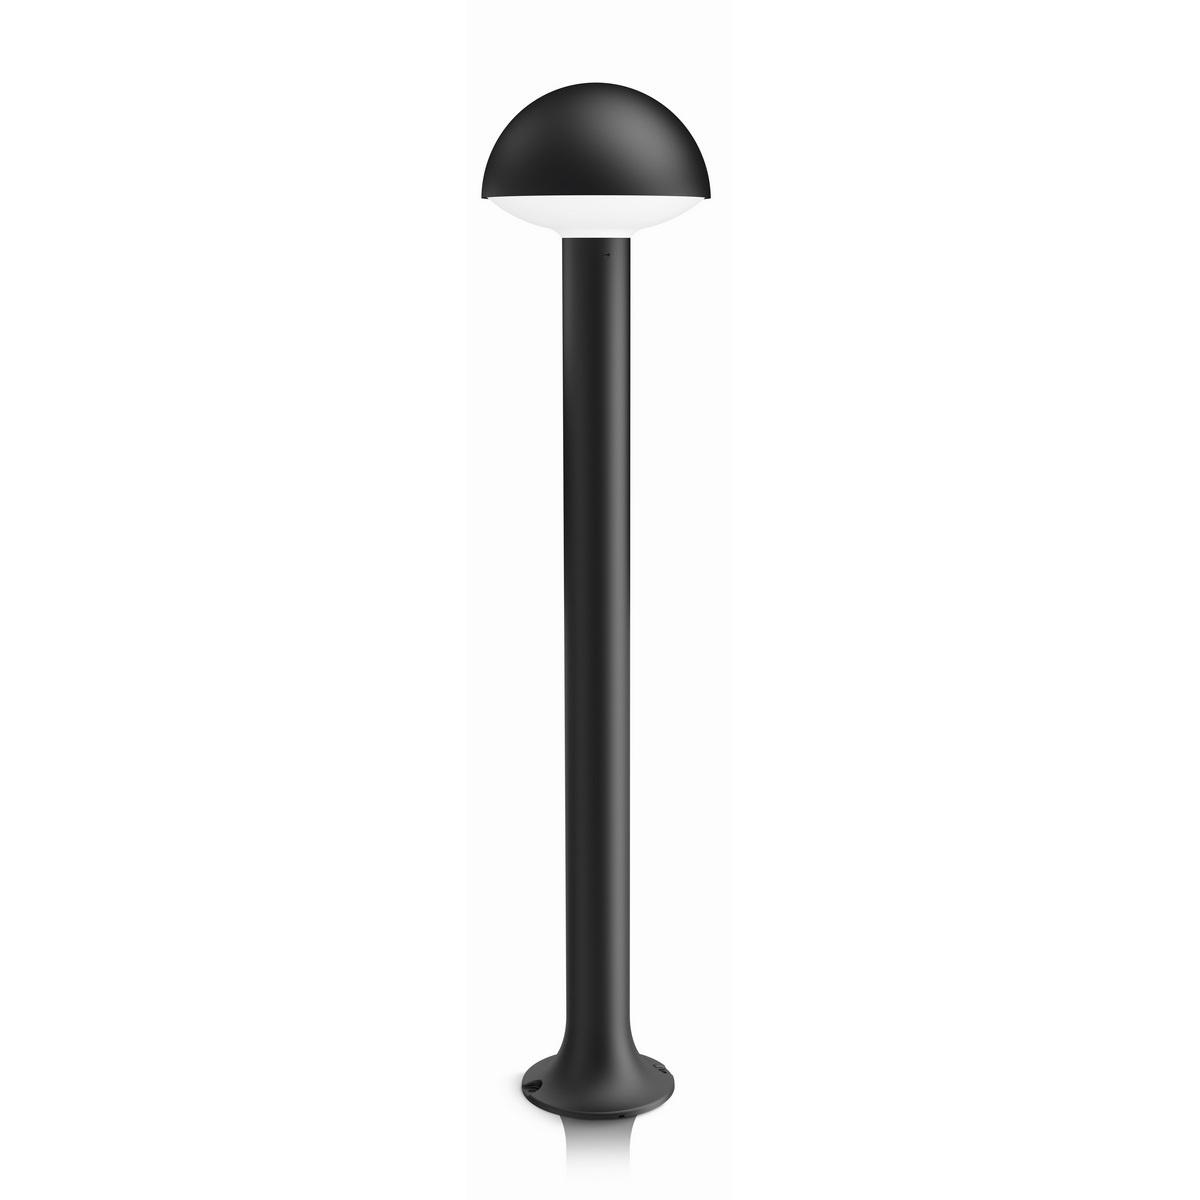 Philips 16408/93/16 Dust Vonkajšie stĺpikové LED svietidlo 76 cm, antracit